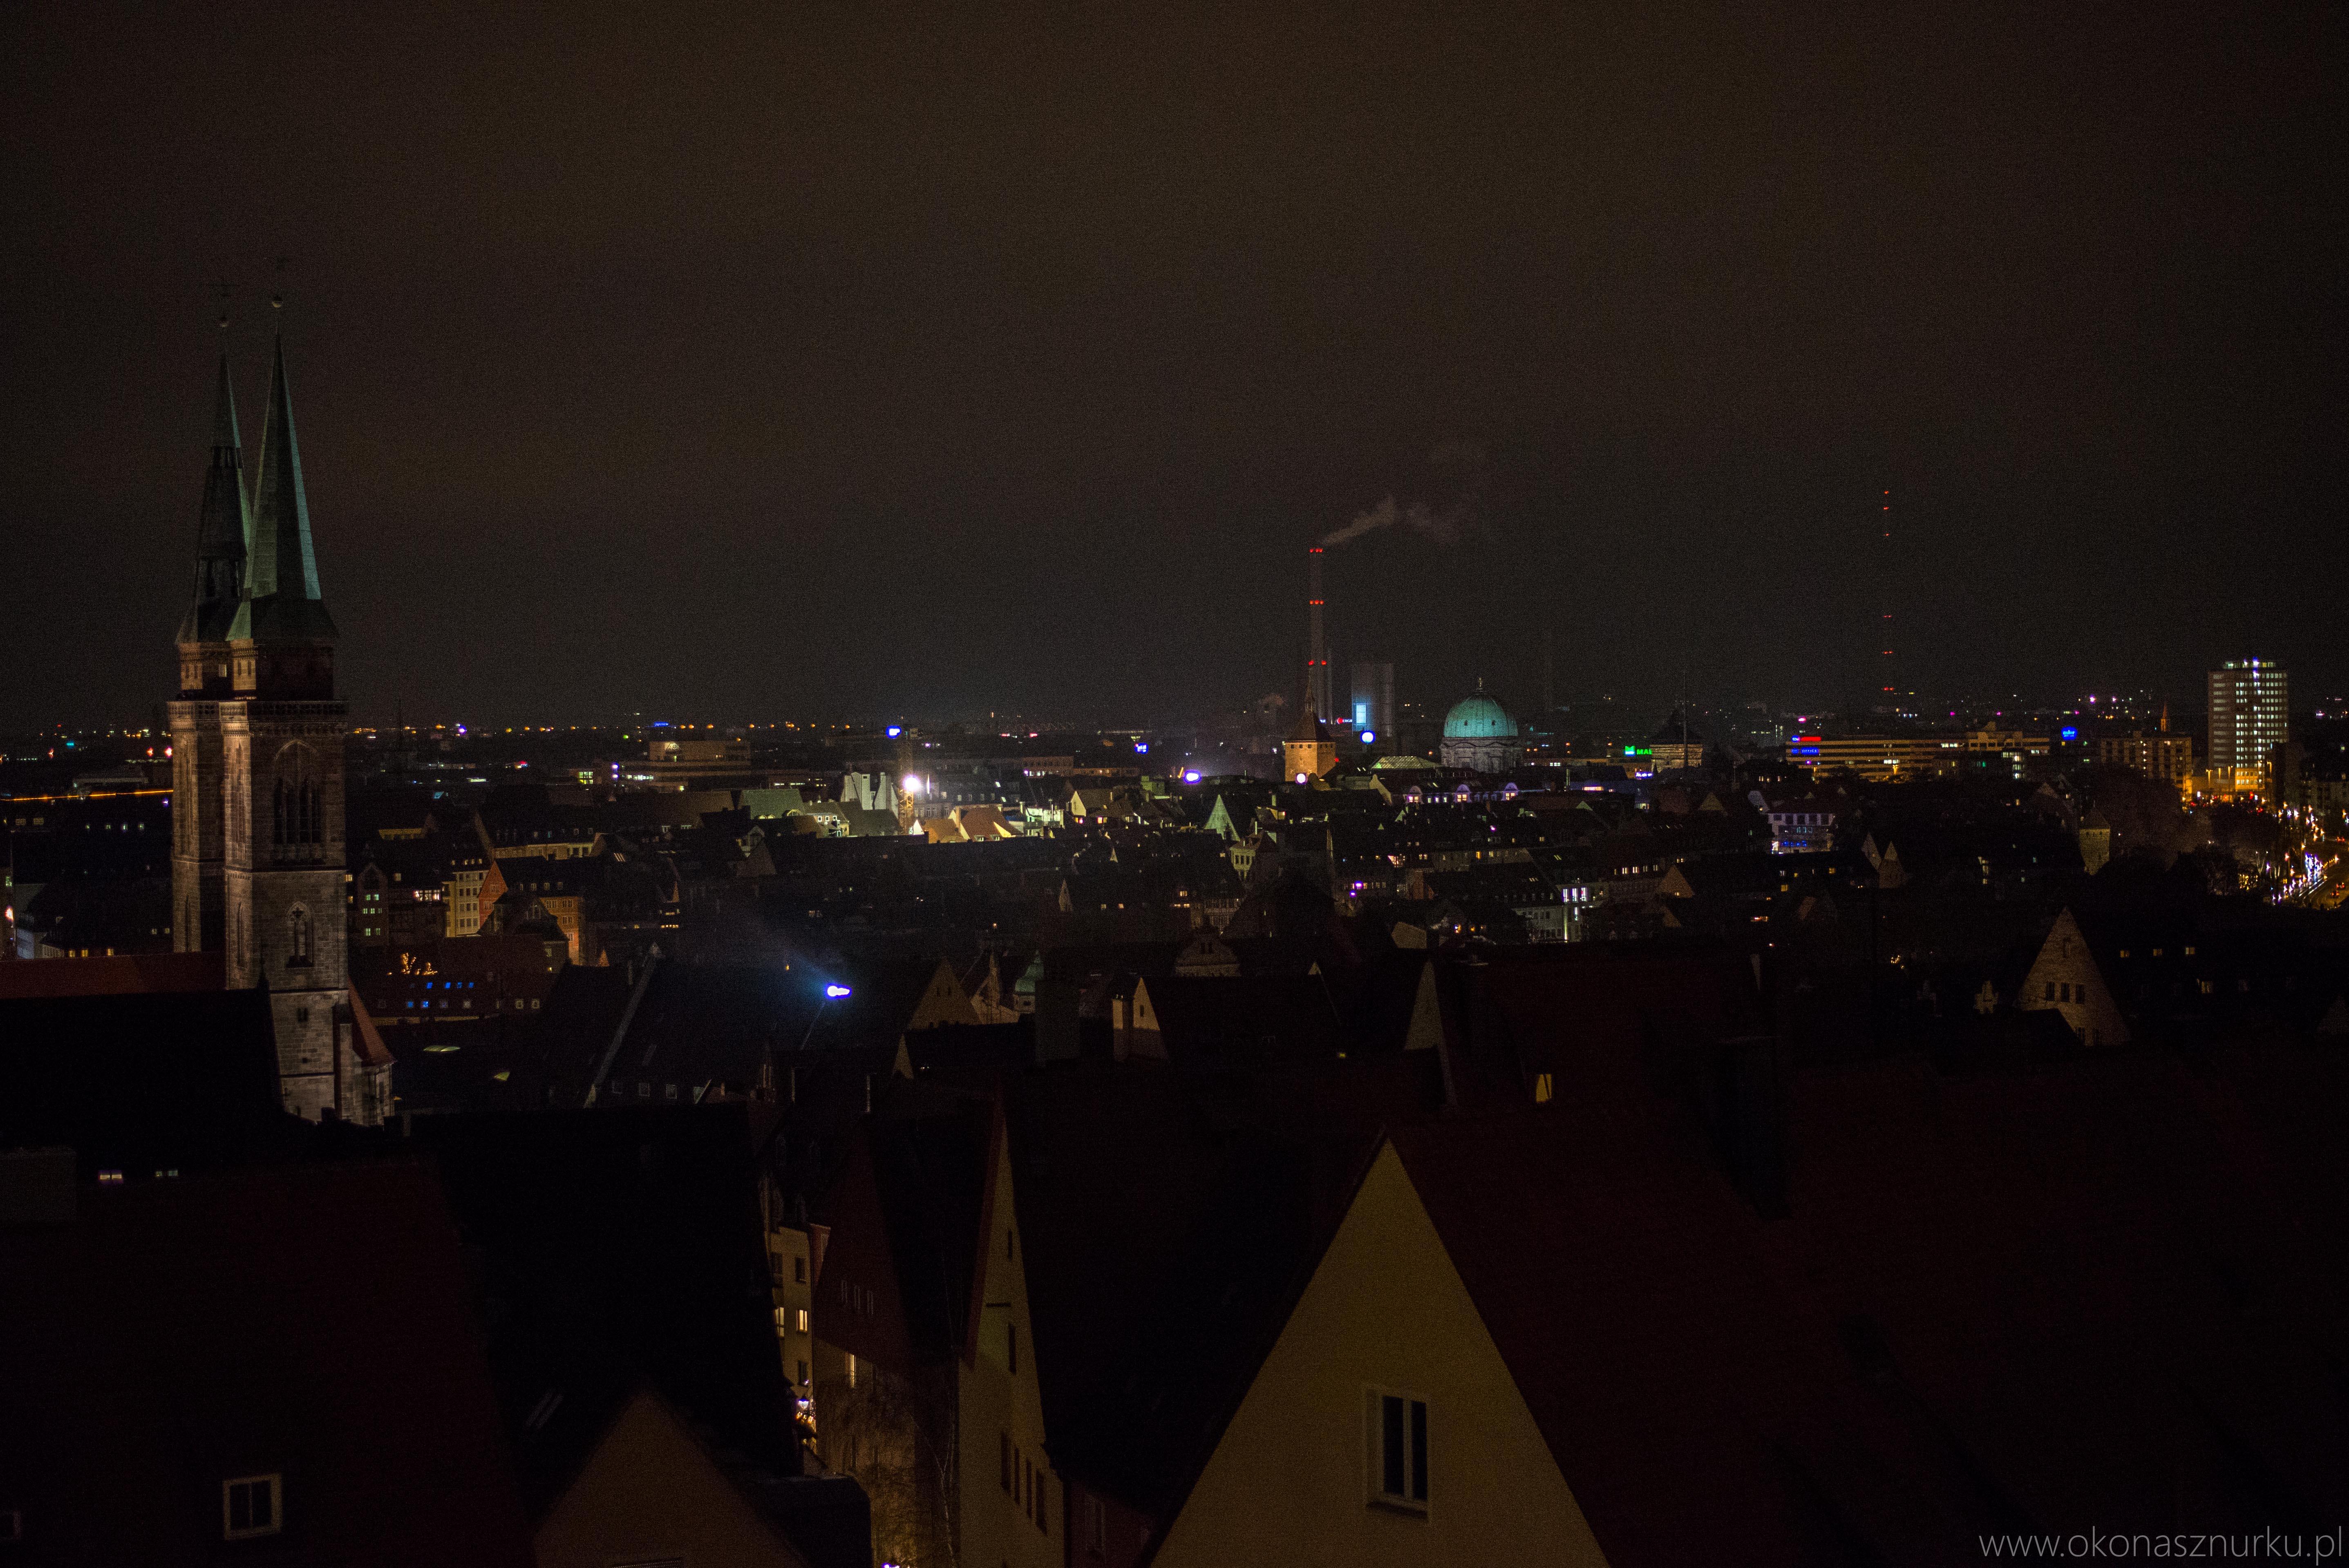 Nürnberg-stadt-norymberga-bayern-city-frankonia (49)